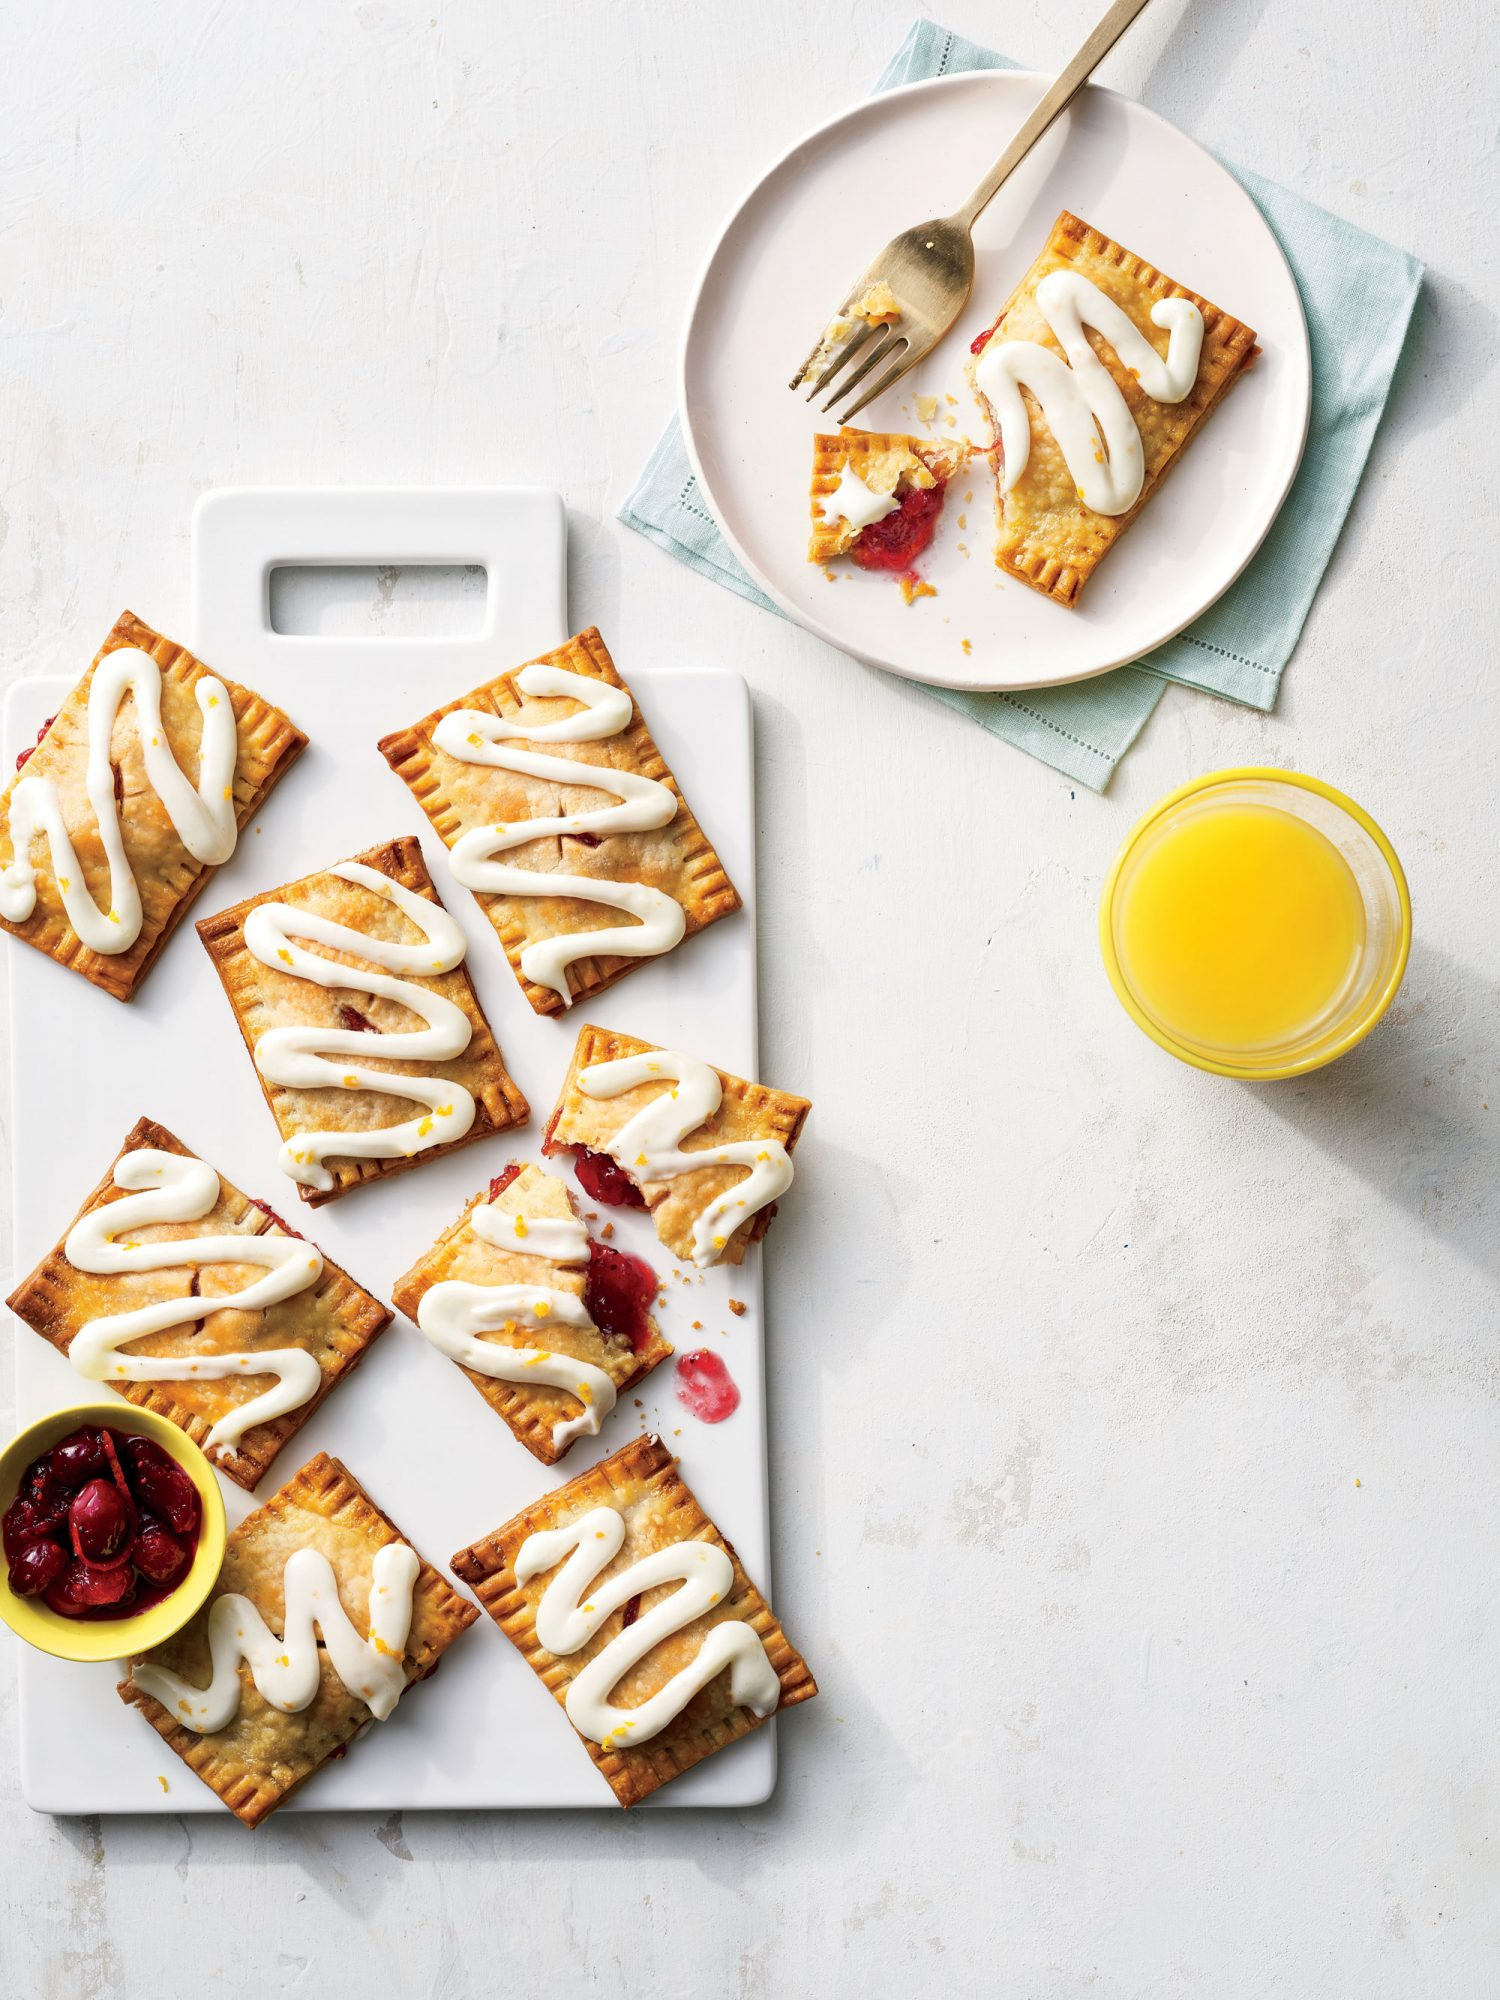 Cranberry Breakfast Pastries